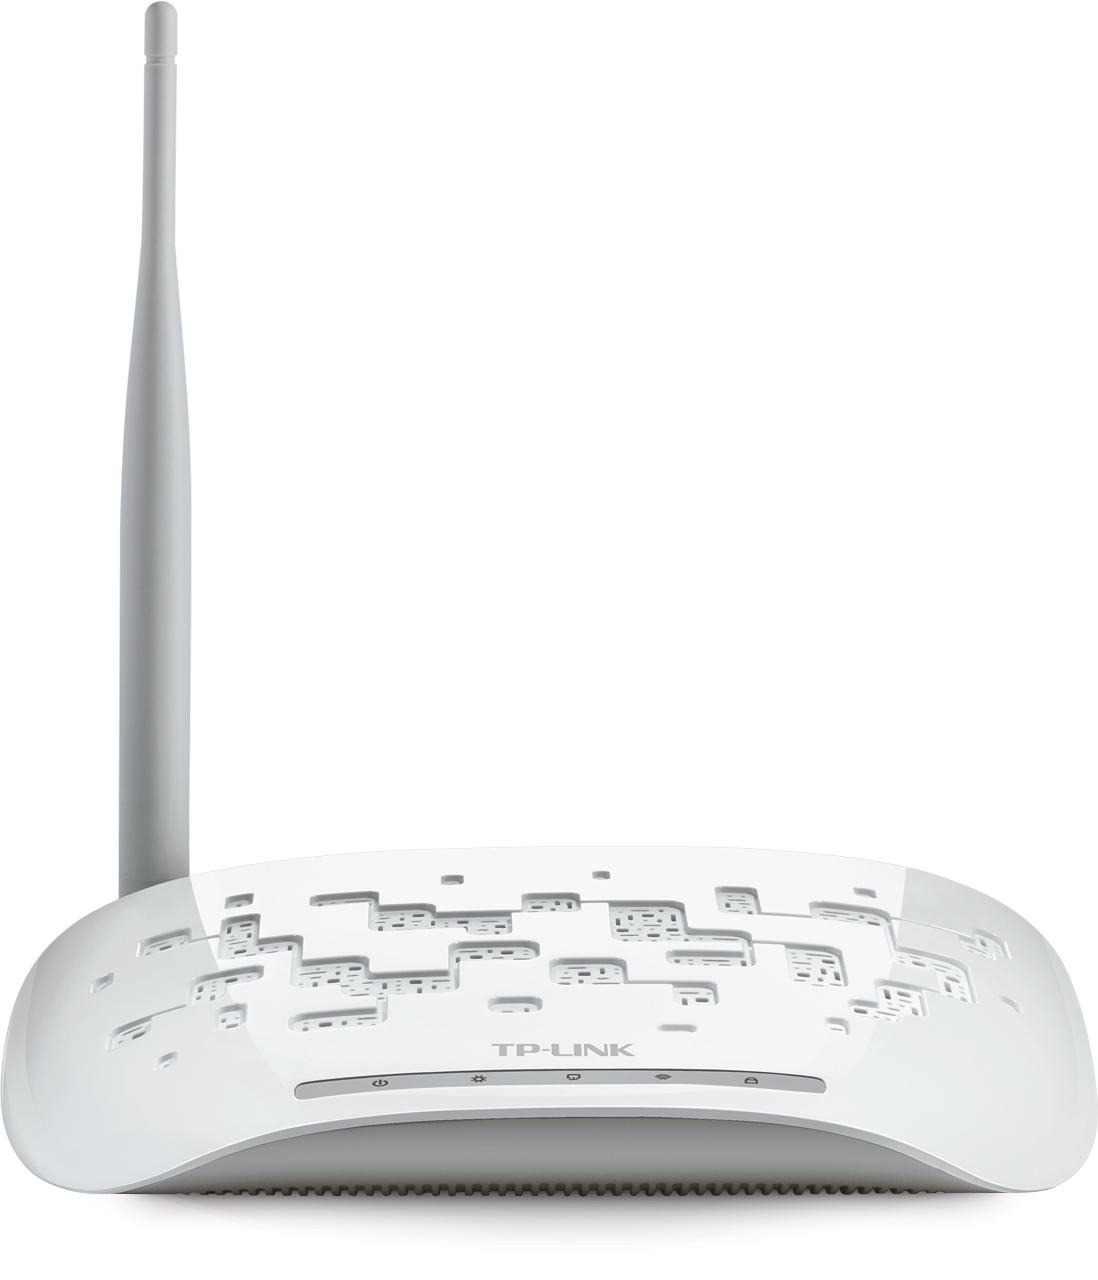 TP-LINK TL-WA701ND Lite N 150Mbps Access Point - Drahtlose Basisstation - 802.11b/g/n